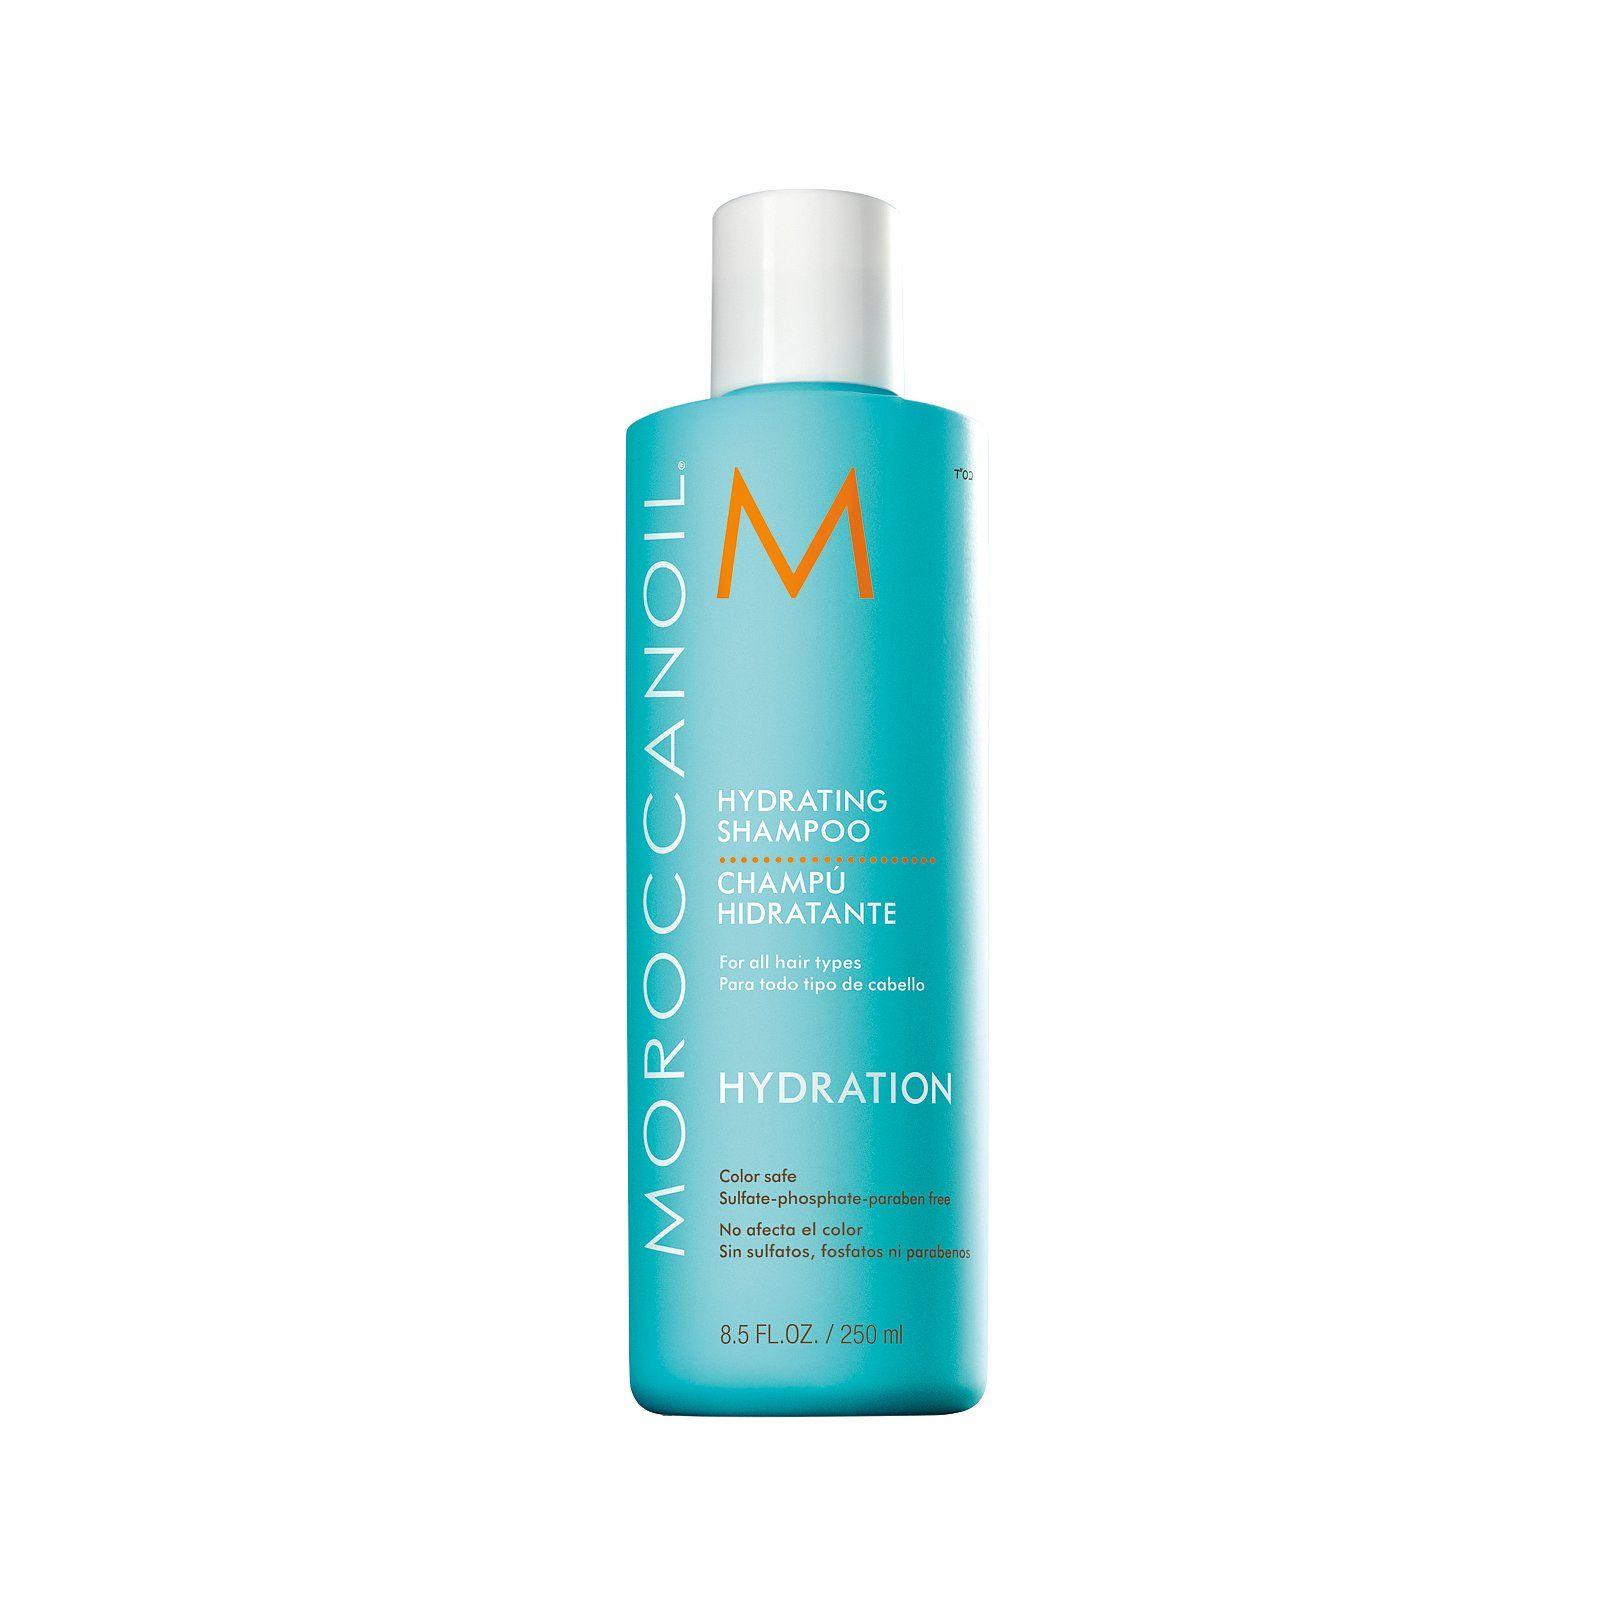 Moroccanoil Hydrating Shampoo Hydrating shampoo